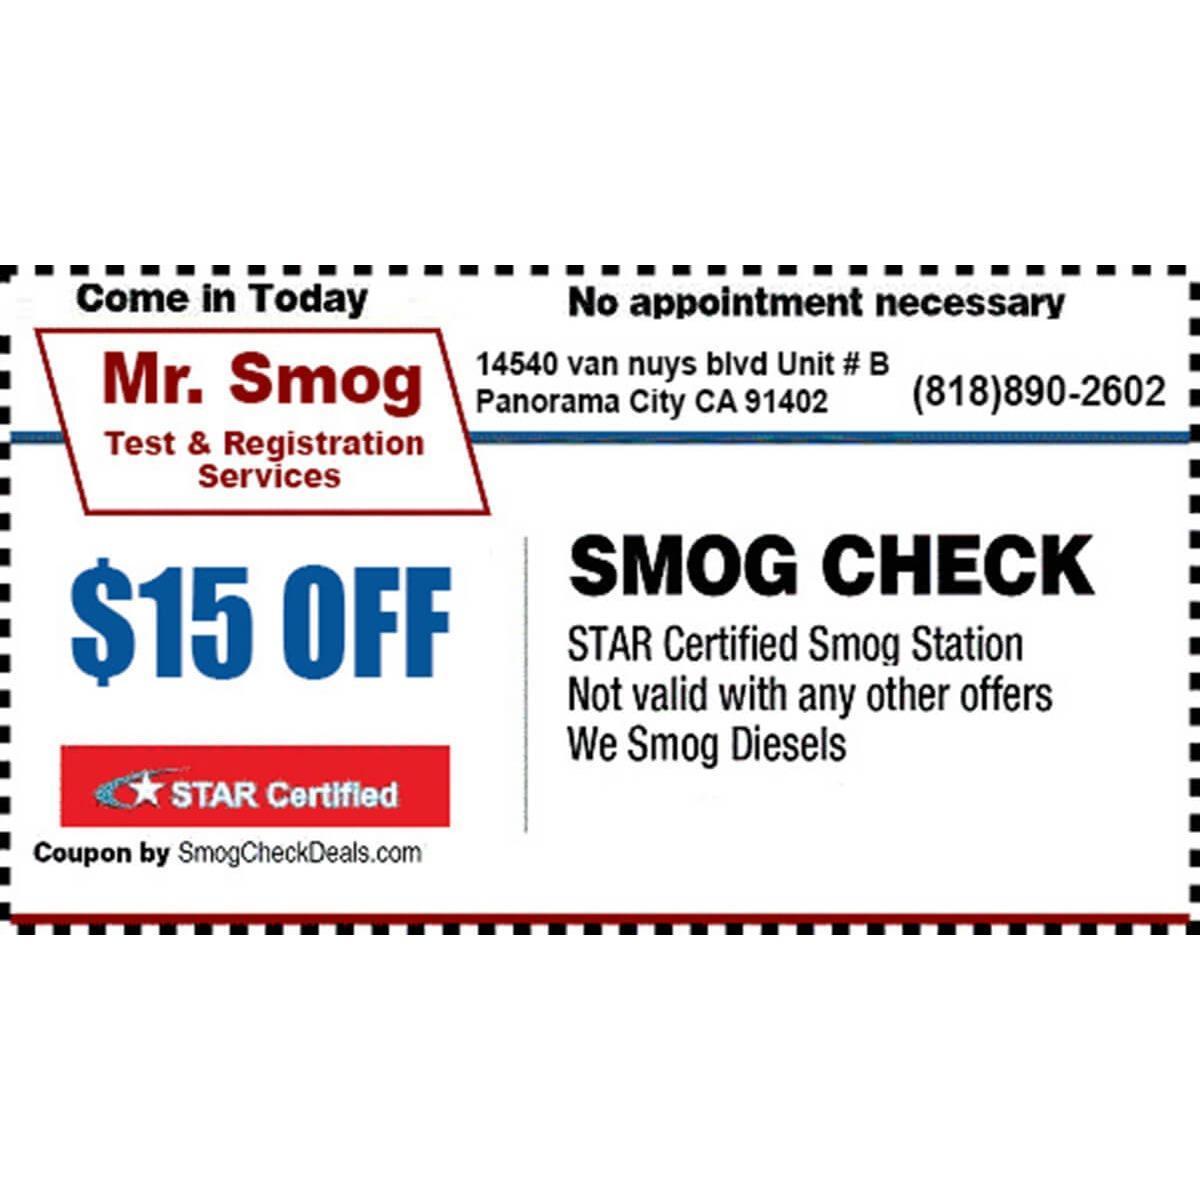 Mr Smog and Registration Services image 2